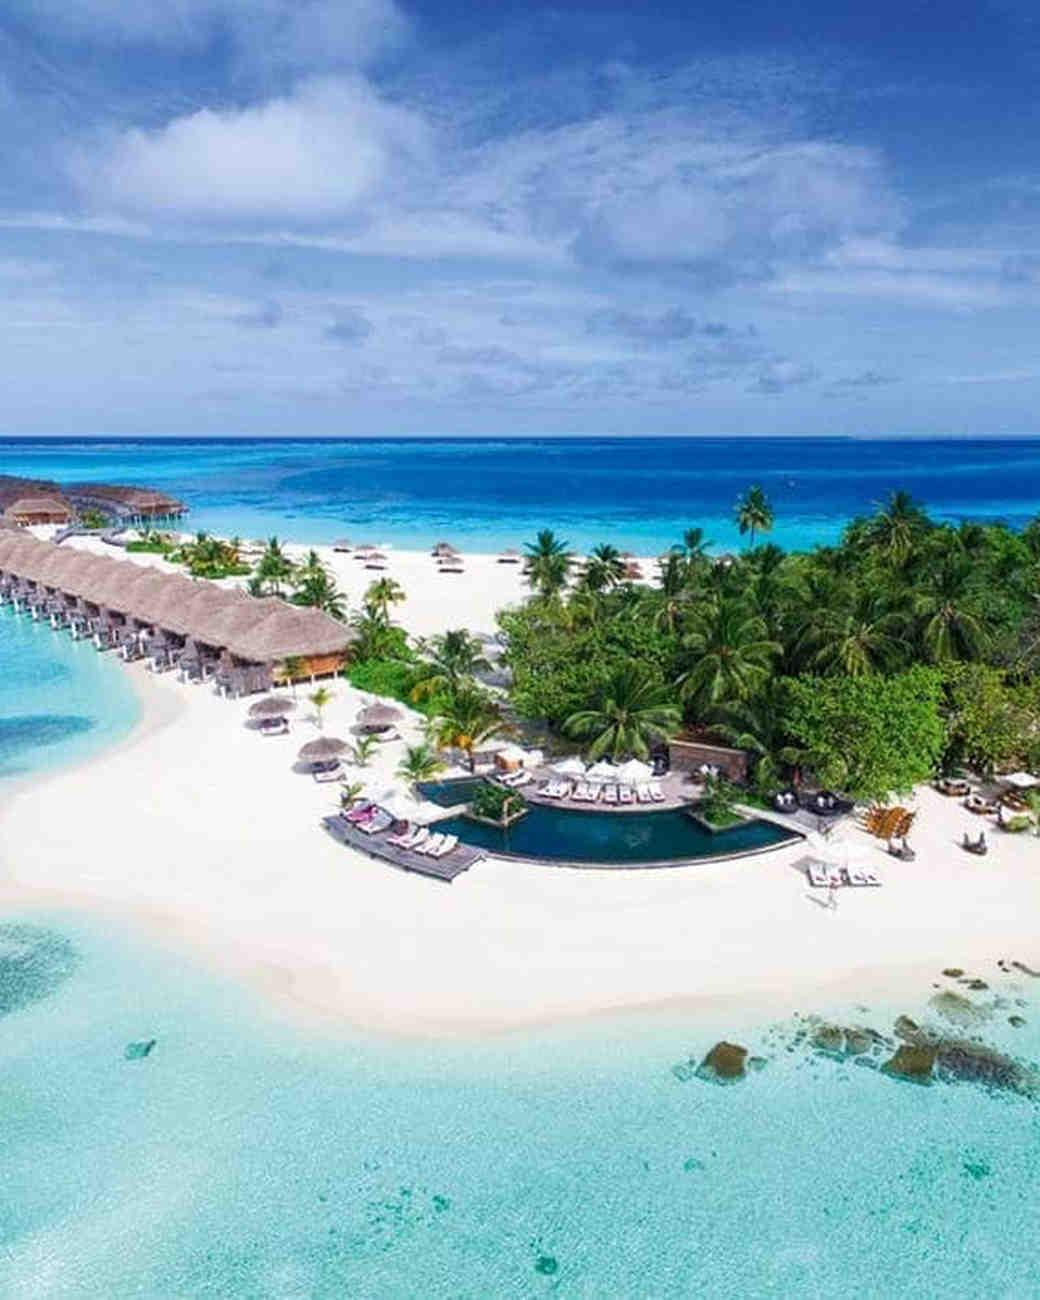 maldives hotels constance moofushi